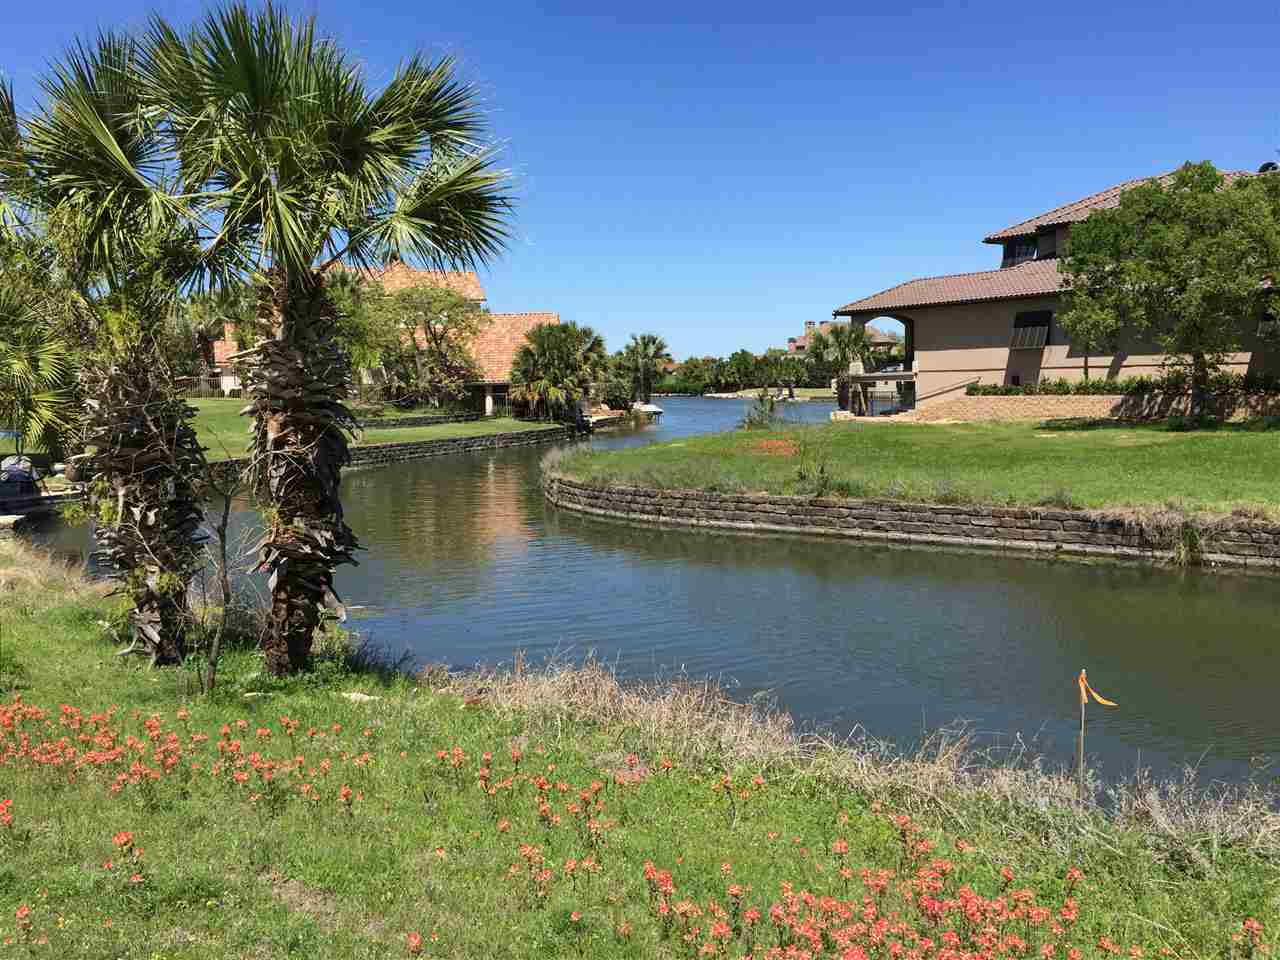 Land for Sale at 85-B Applehead Island Horseshoe Bay, Texas 78657 United States